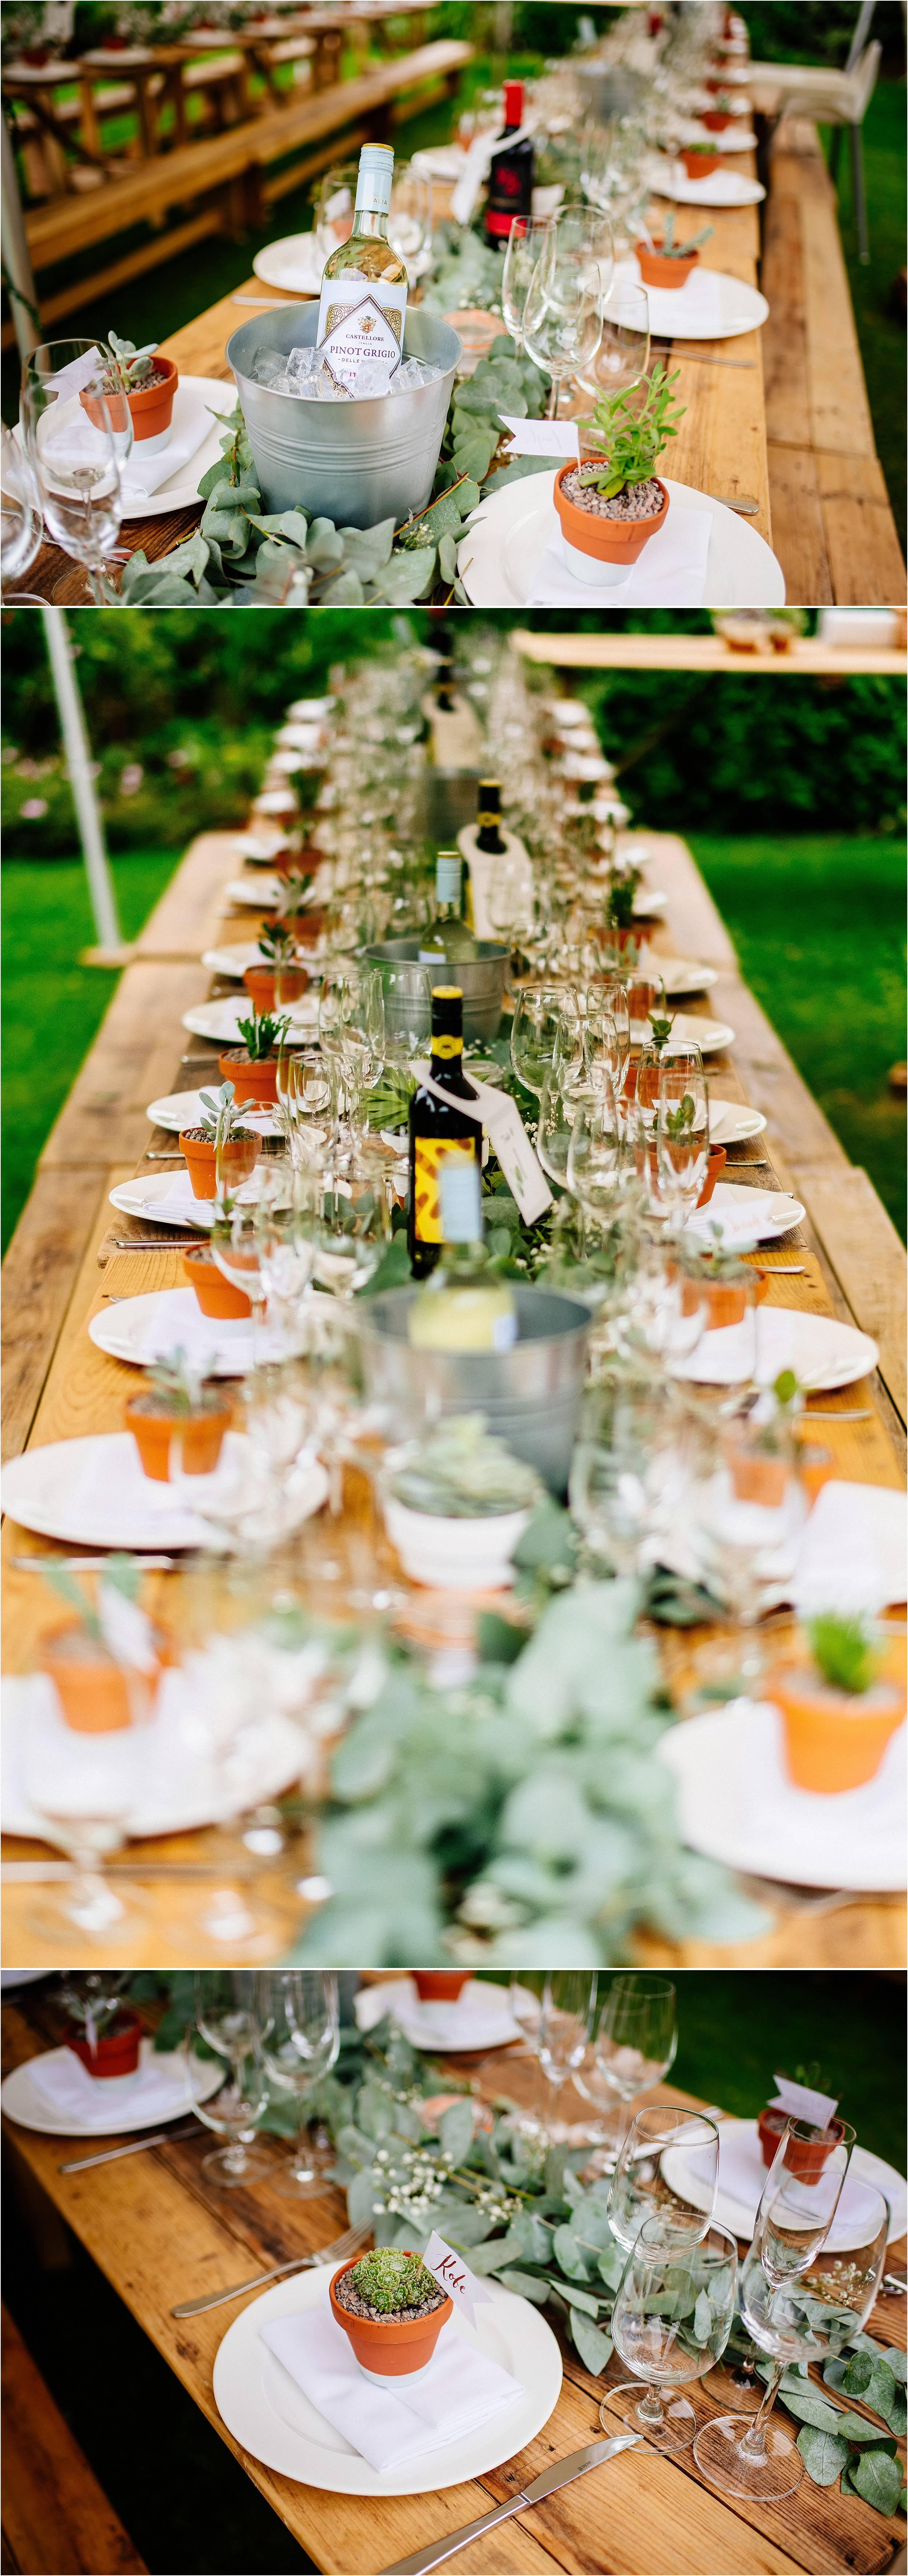 Barnsdale Gardens Wedding Photographer_0018.jpg